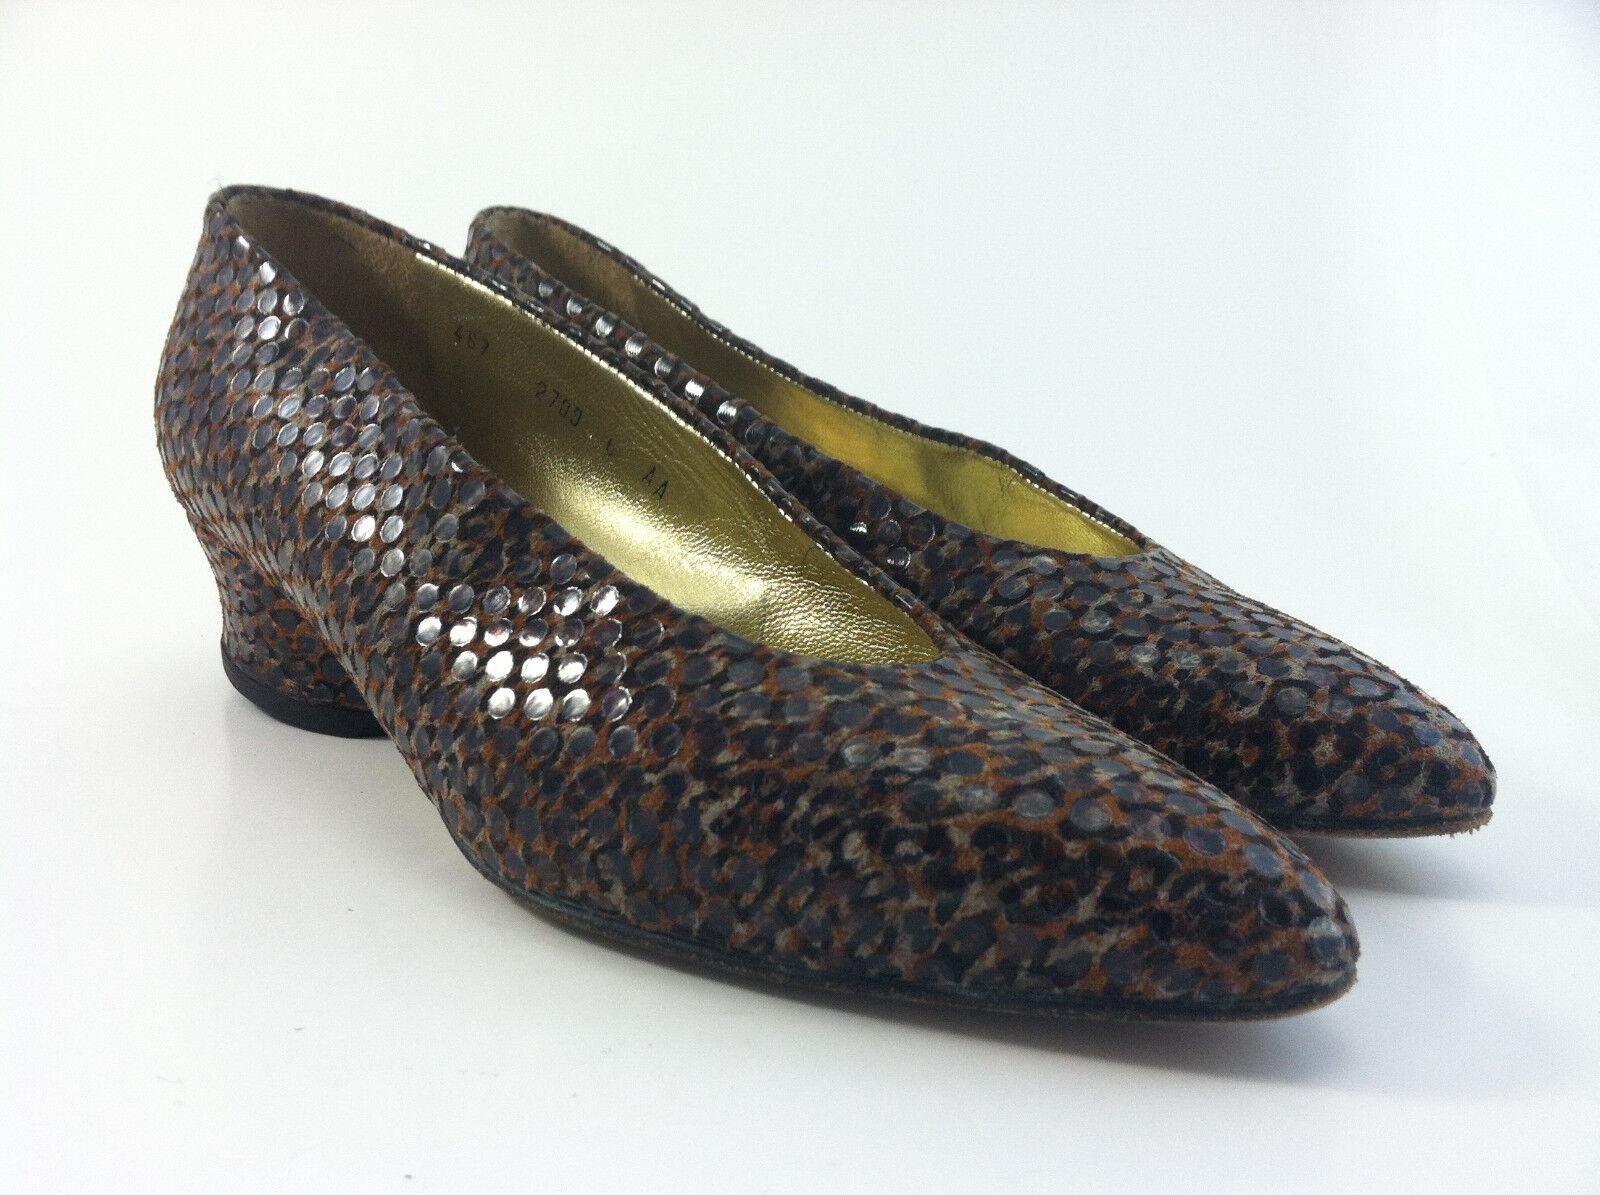 Walter steiger donna low heel classic pump animal print soft fabric Dimensione 6 AA